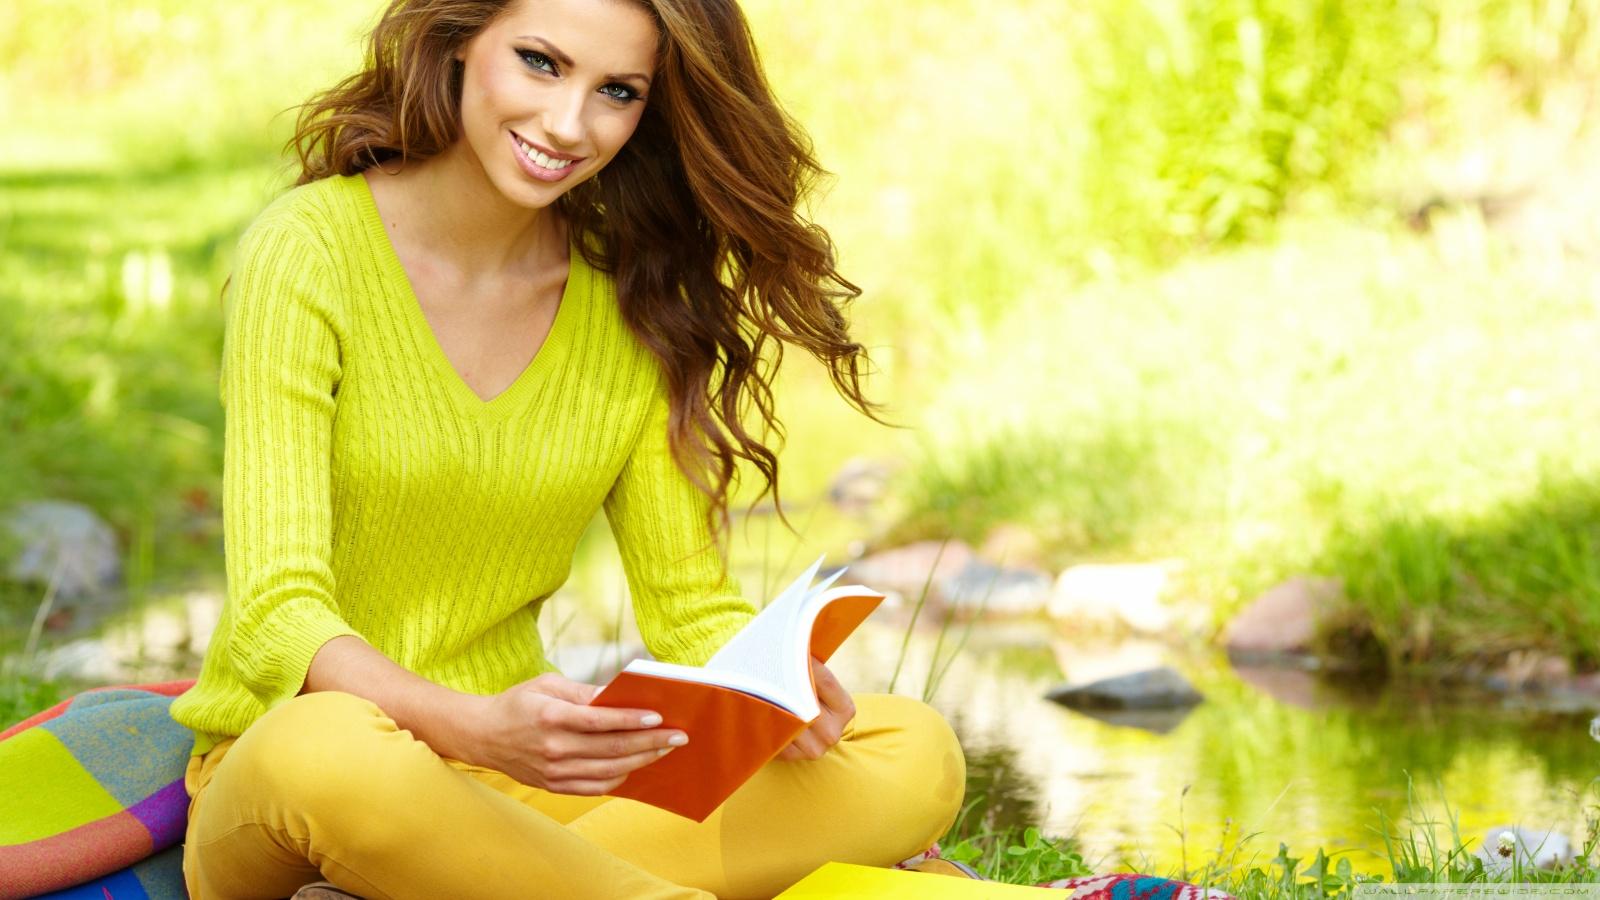 girl_reading_a_book_2-wallpaper-1600x900